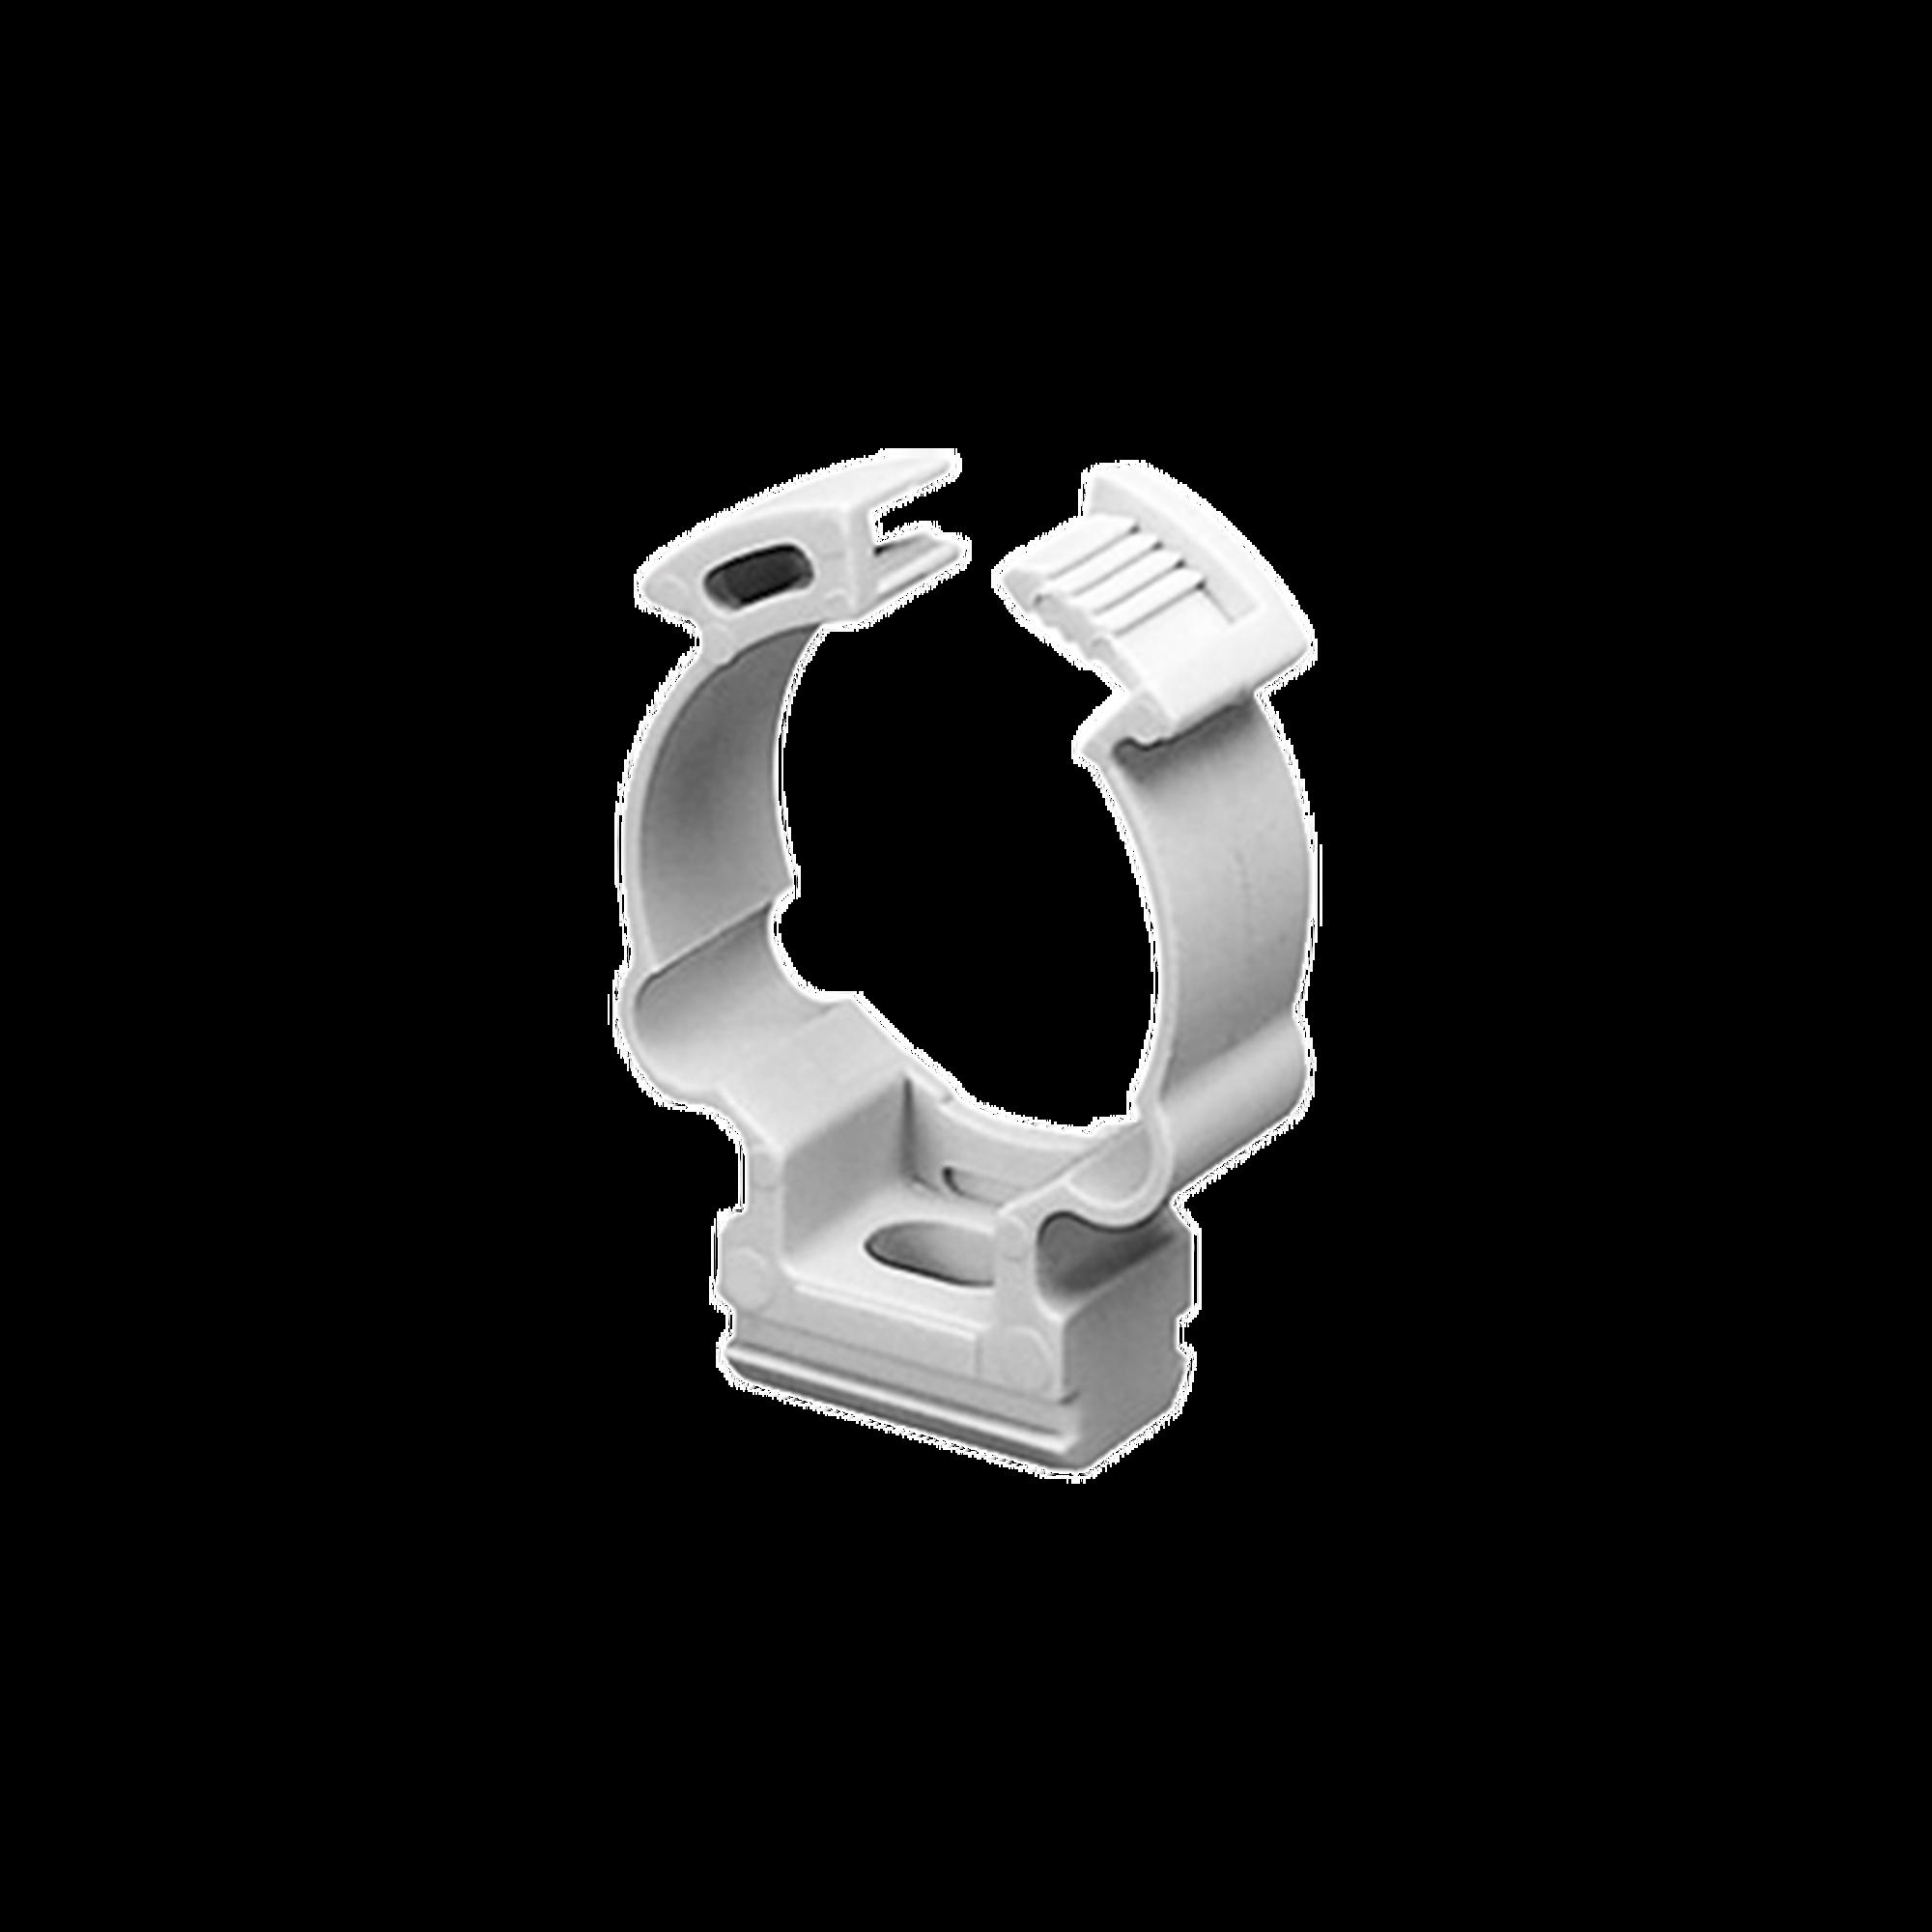 Soporte de collar (Abrazadera), PVC Auto-extinguible, cerrado para tubería de 50 mm